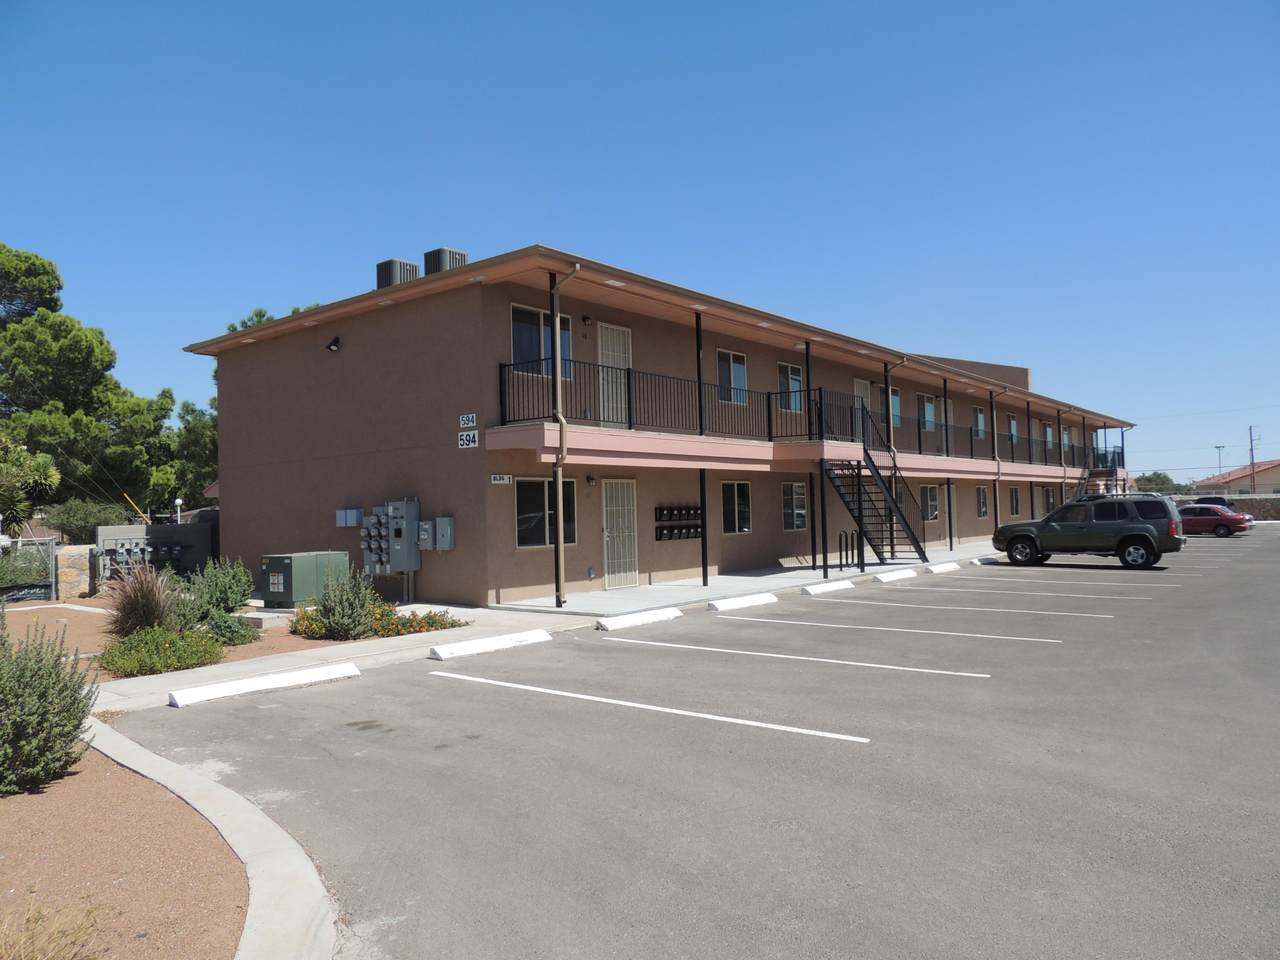 594 Lomaland Drive - Photo 1